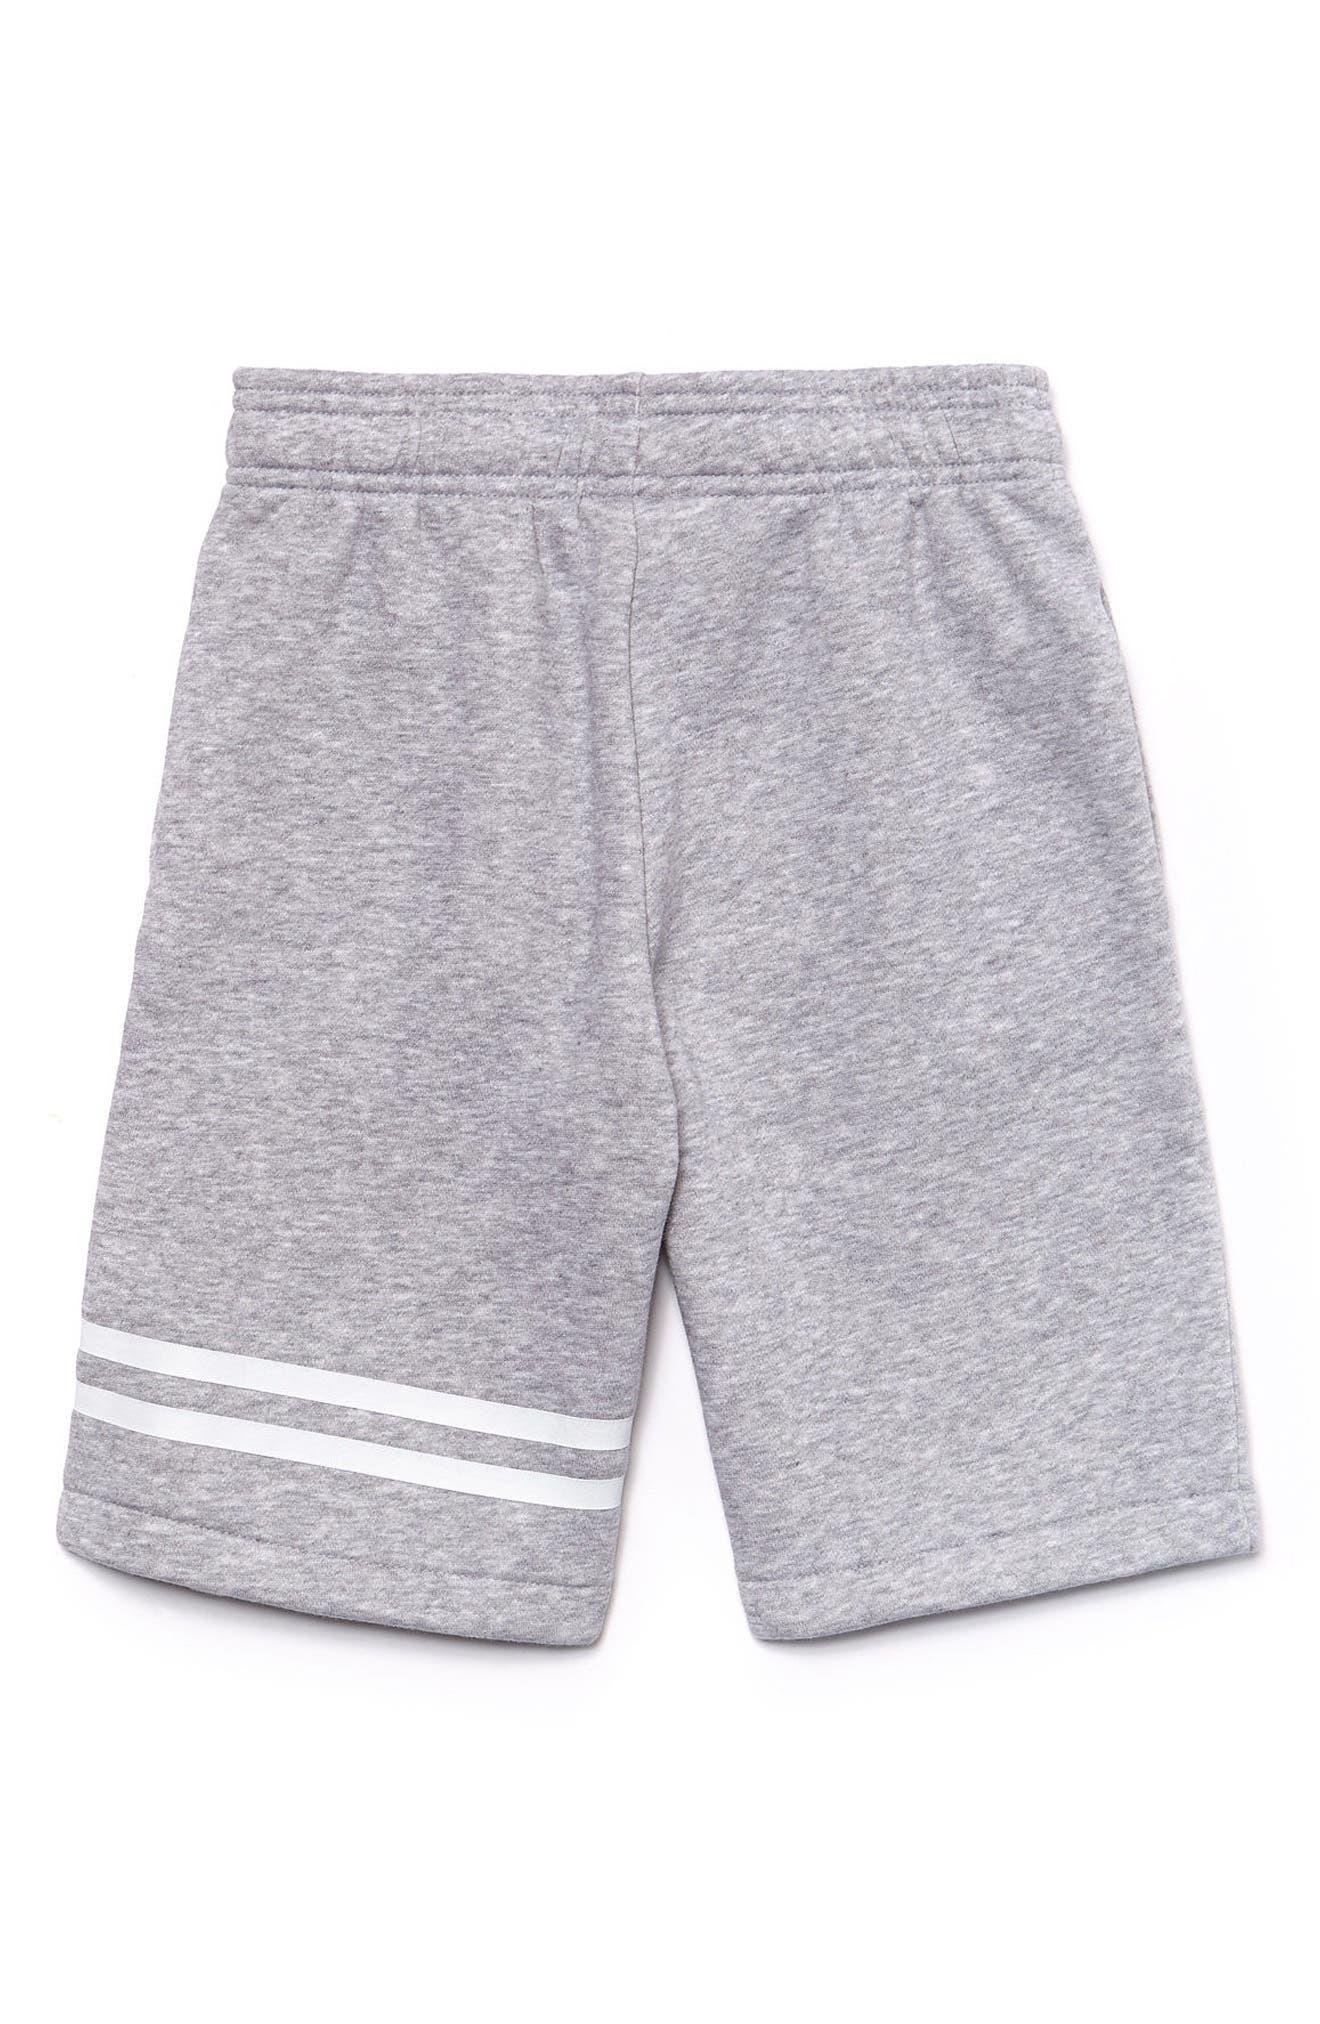 Sport Knit Shorts,                             Alternate thumbnail 2, color,                             Silver Chine/ White